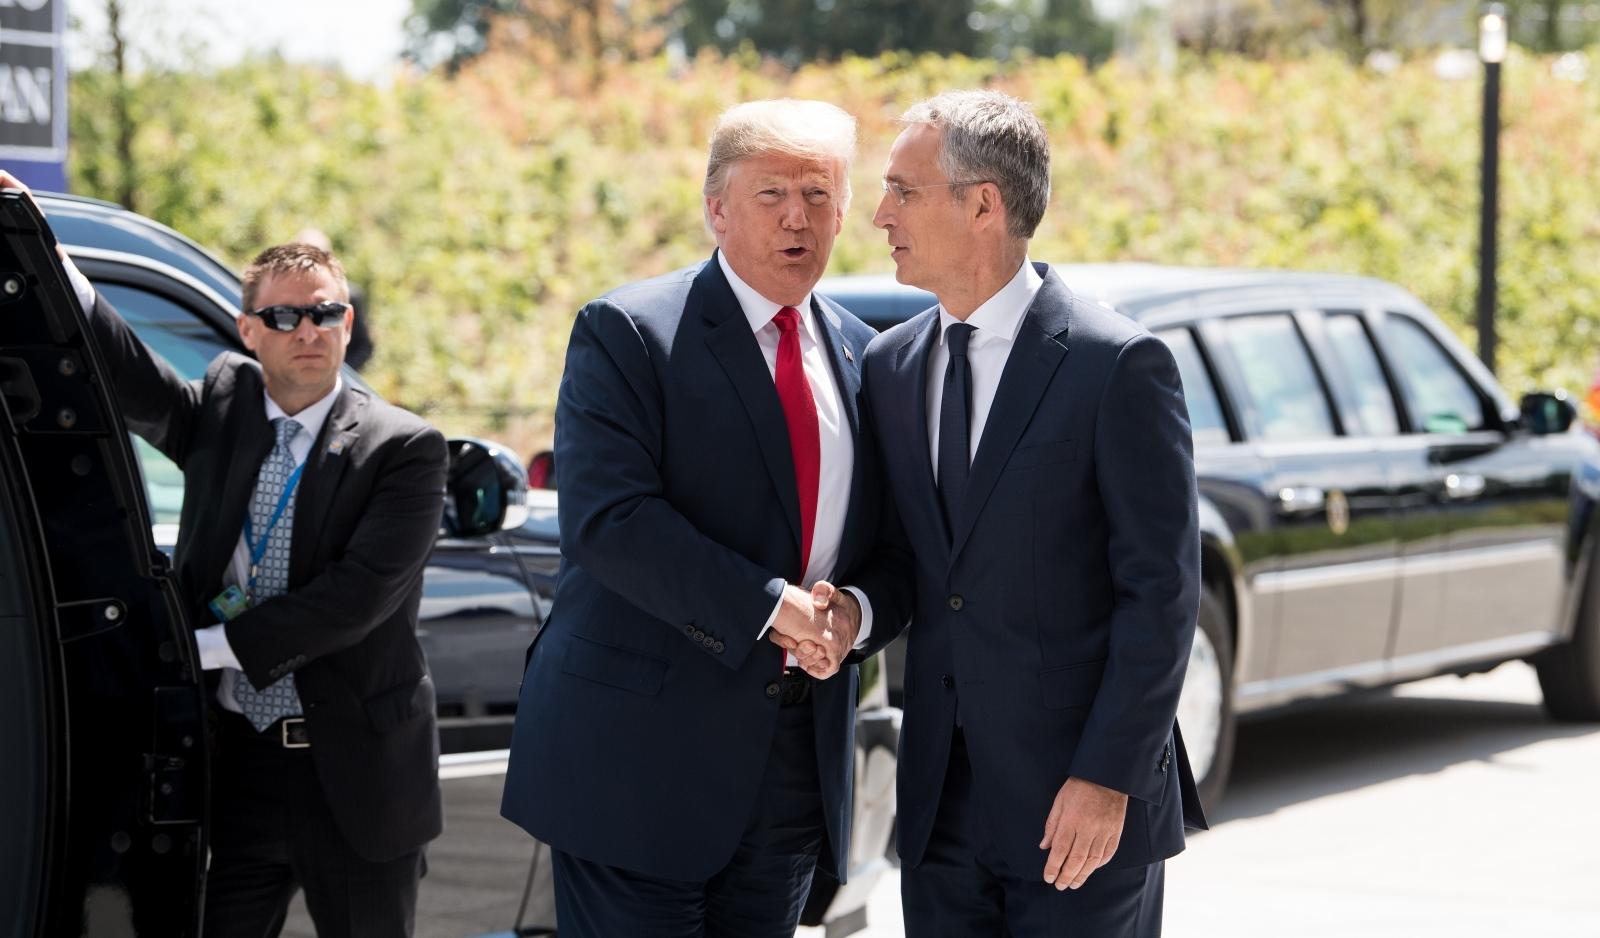 Trump-Stoltenberg  NATO, Bruselj 2018   Vir: Pixell